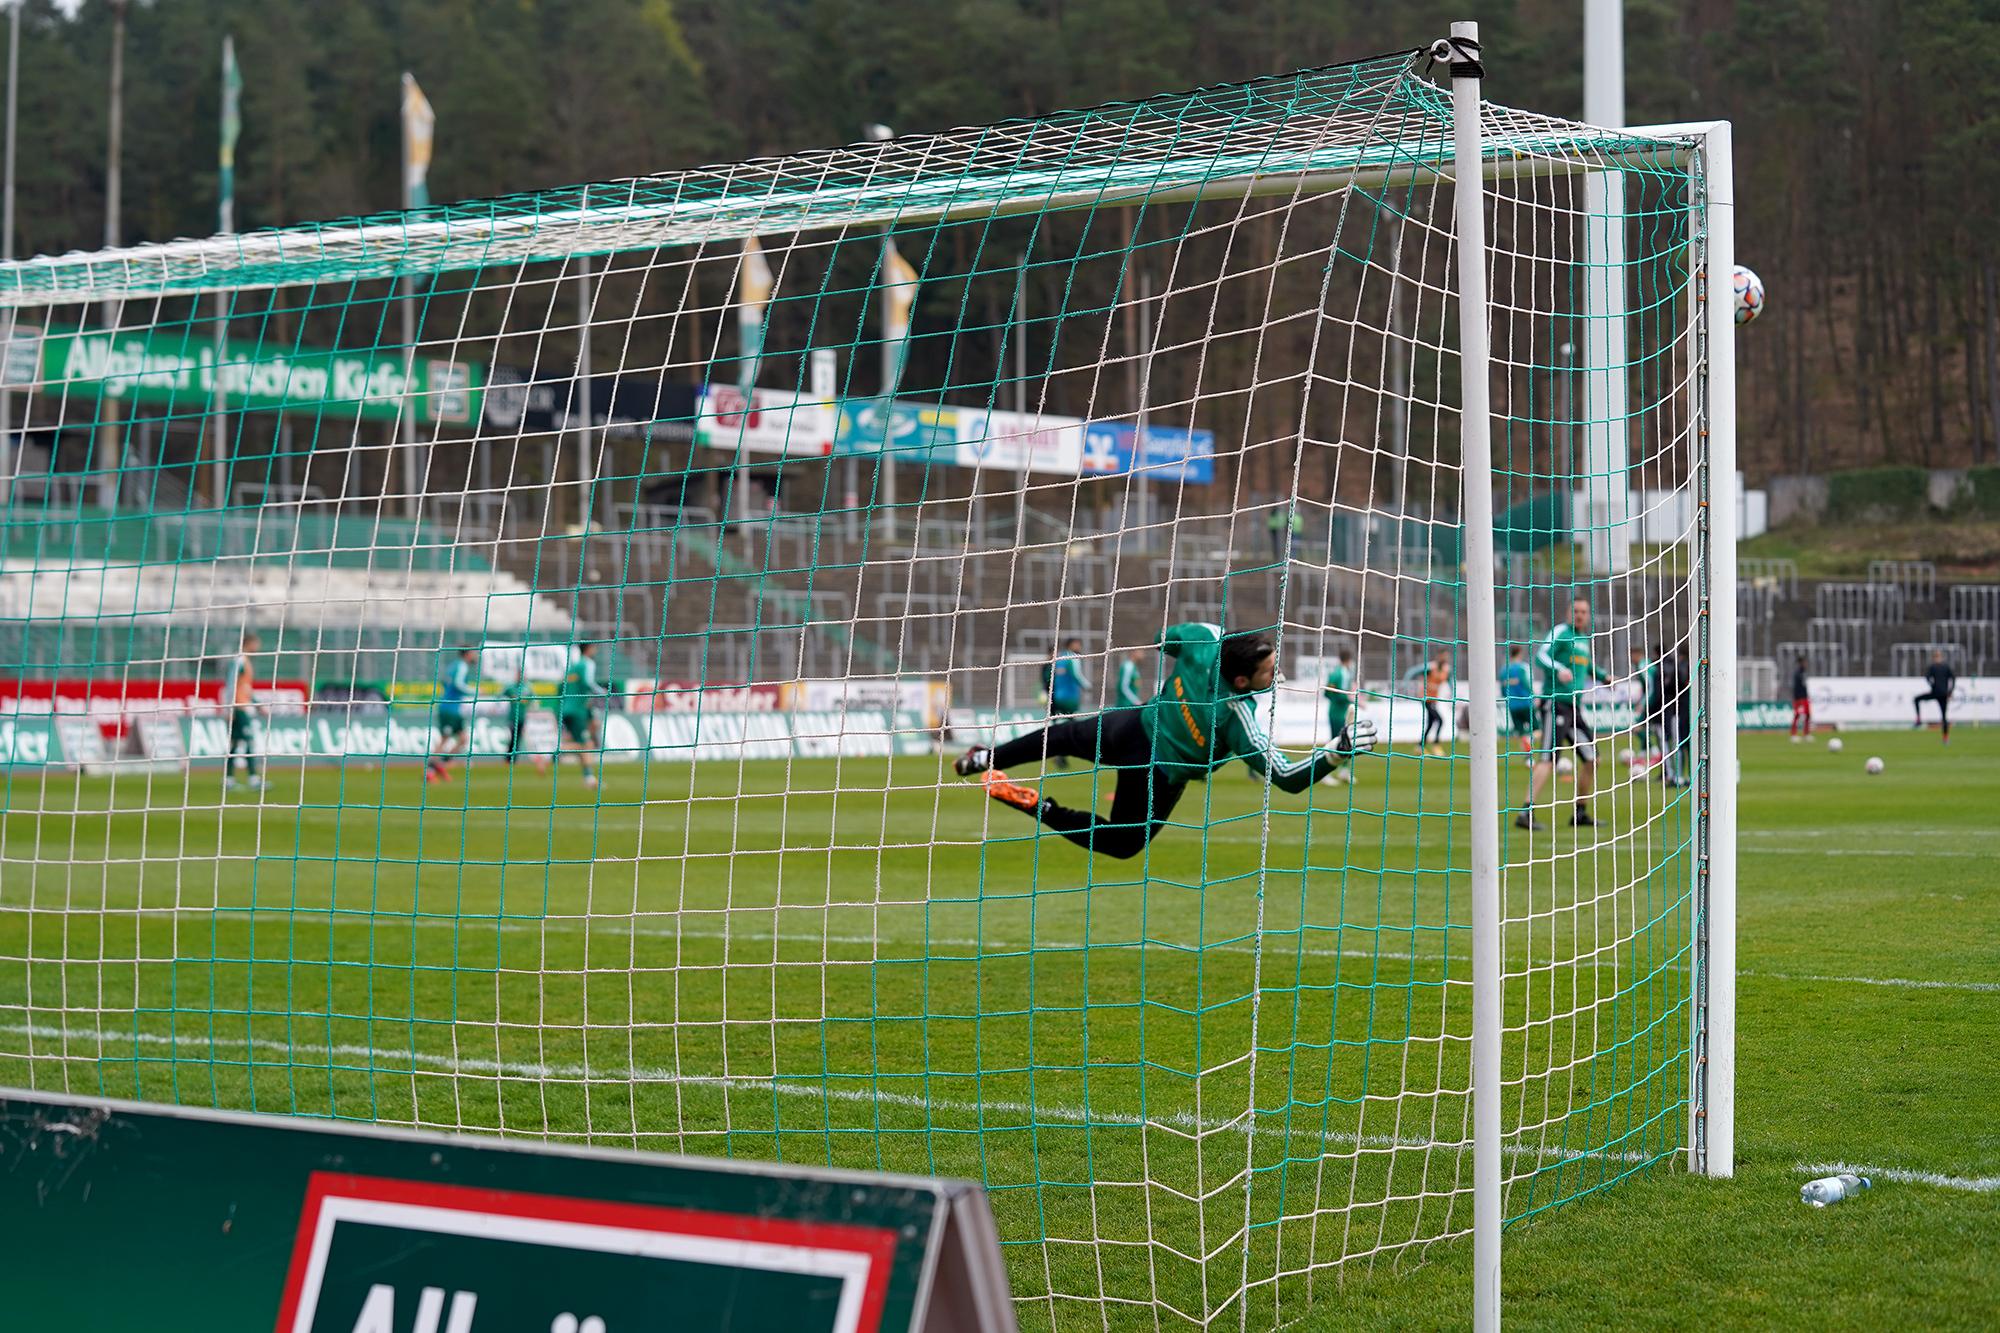 01.05.2021   Saison 2020/21   FC 08 Homburg   SG Sonnenhof Großaspach